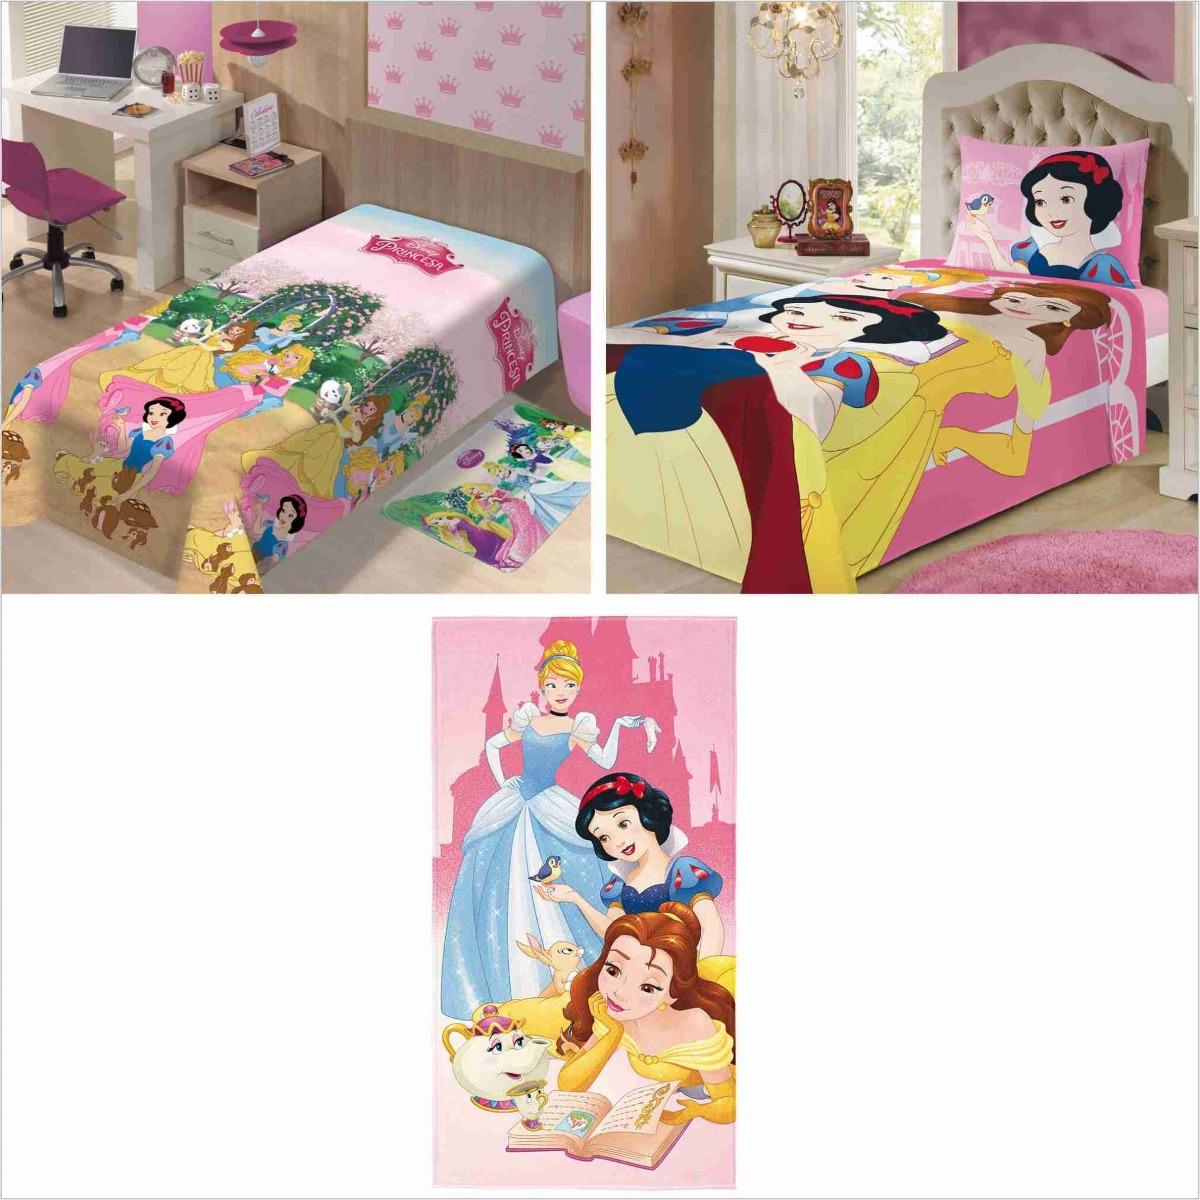 7f9d05c2de Kit 4 Pçs Manta+ Jogo Cama 2pç+ Toalha Princesas Disney - R  234